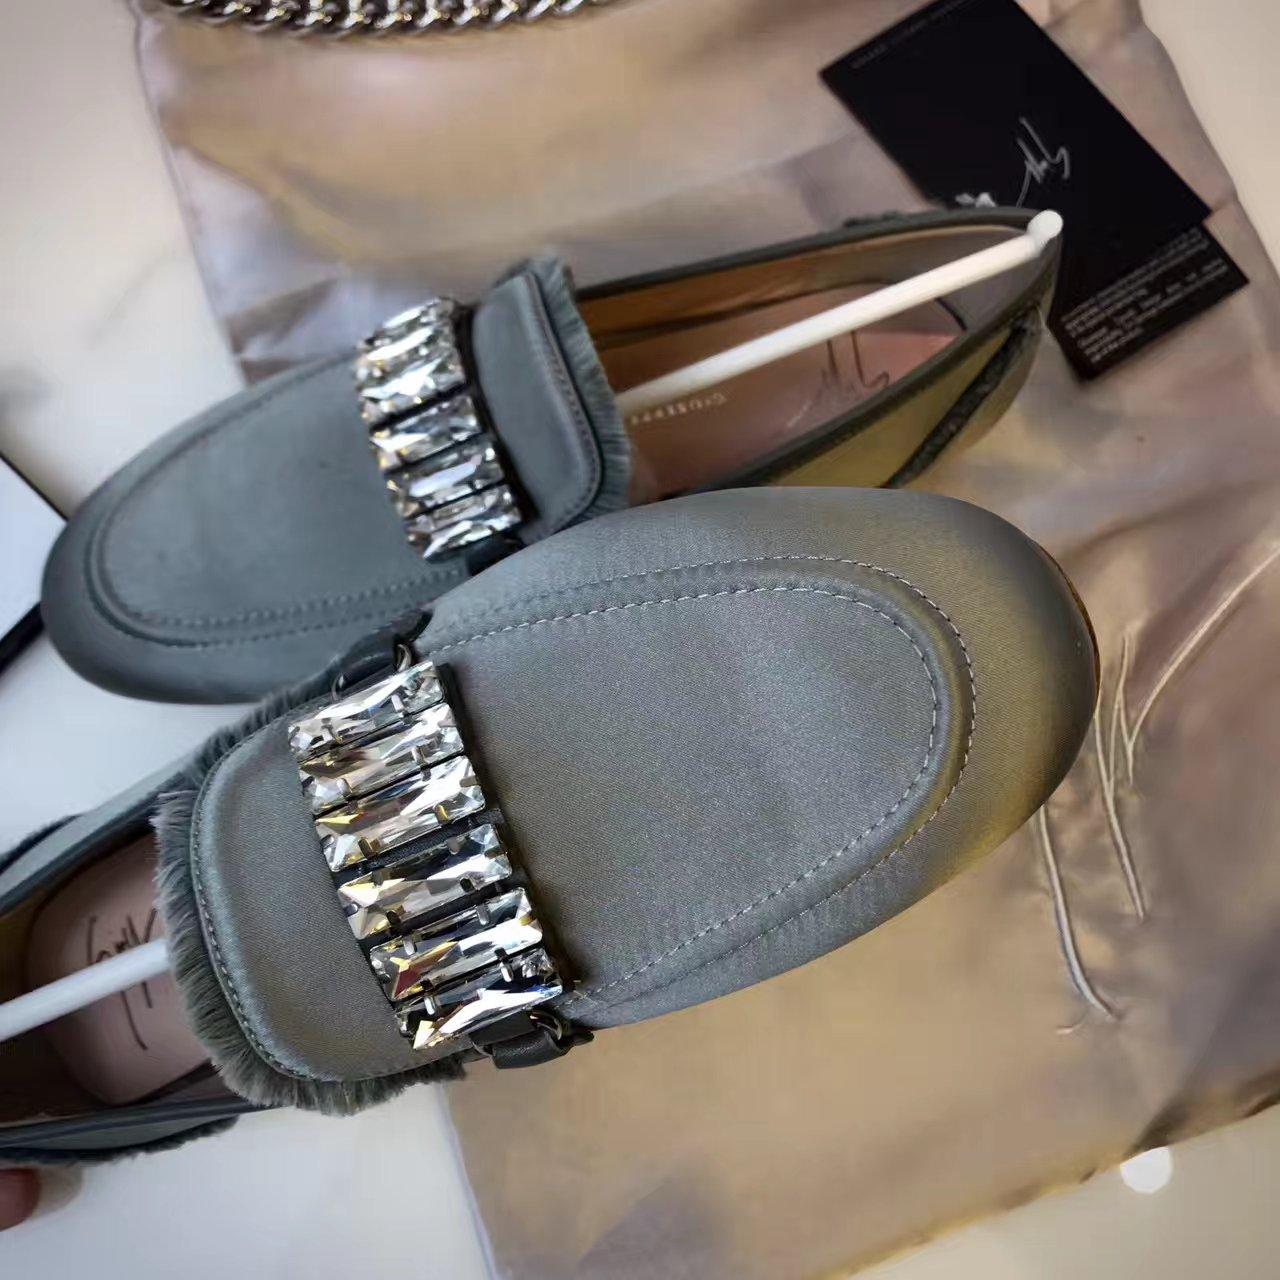 【Giuseppe zanotti】GZ女鞋_平底单鞋